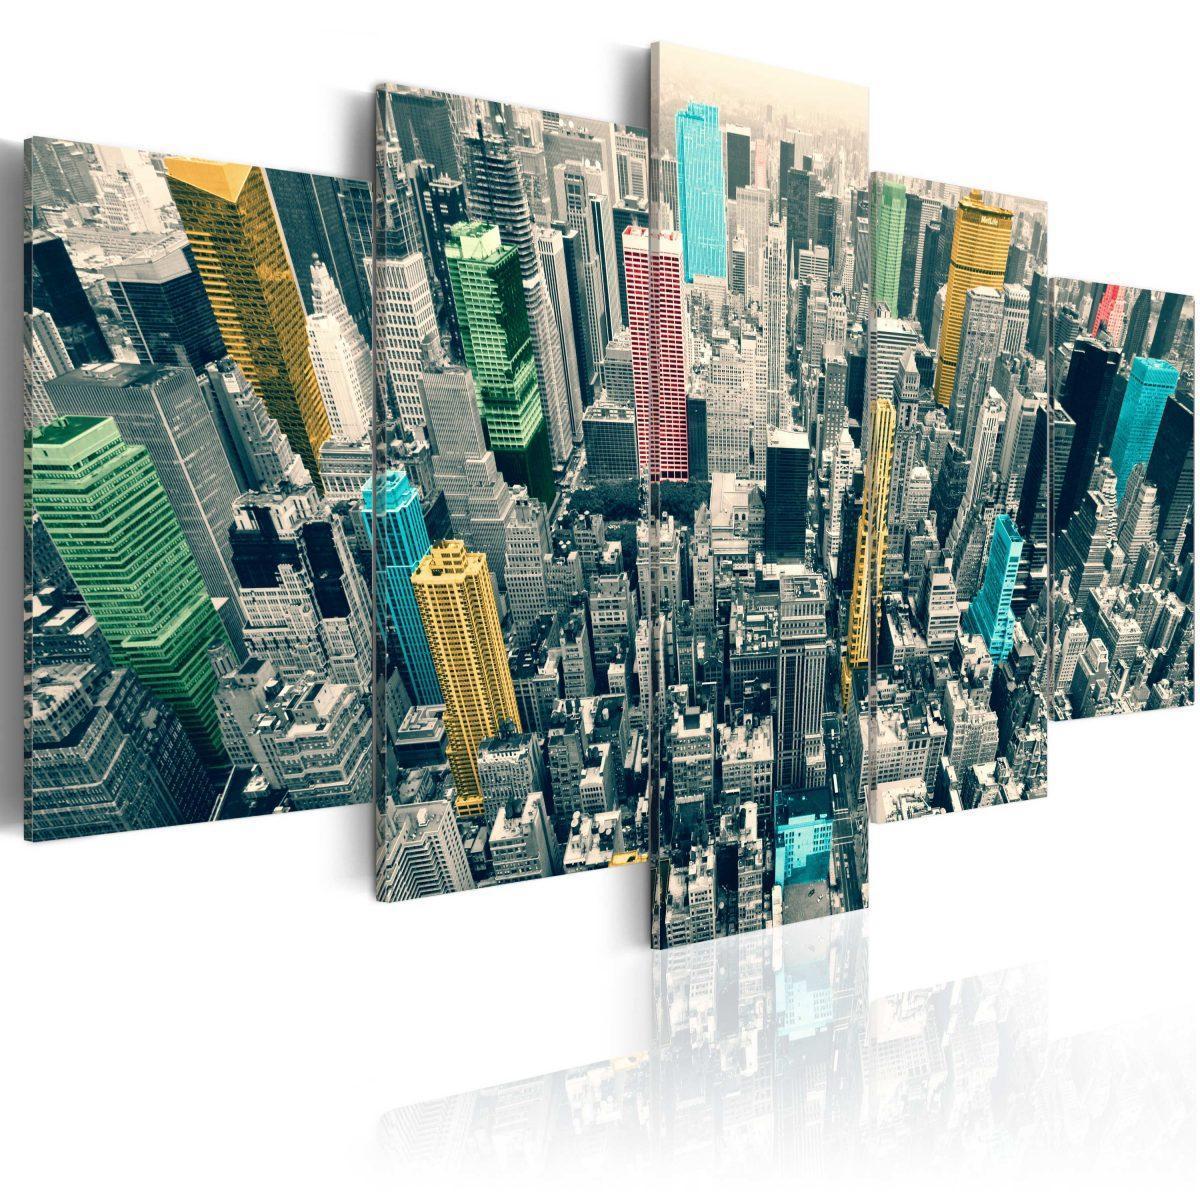 Canvas Tavla - The greyness of the day revived, NY - 100x50